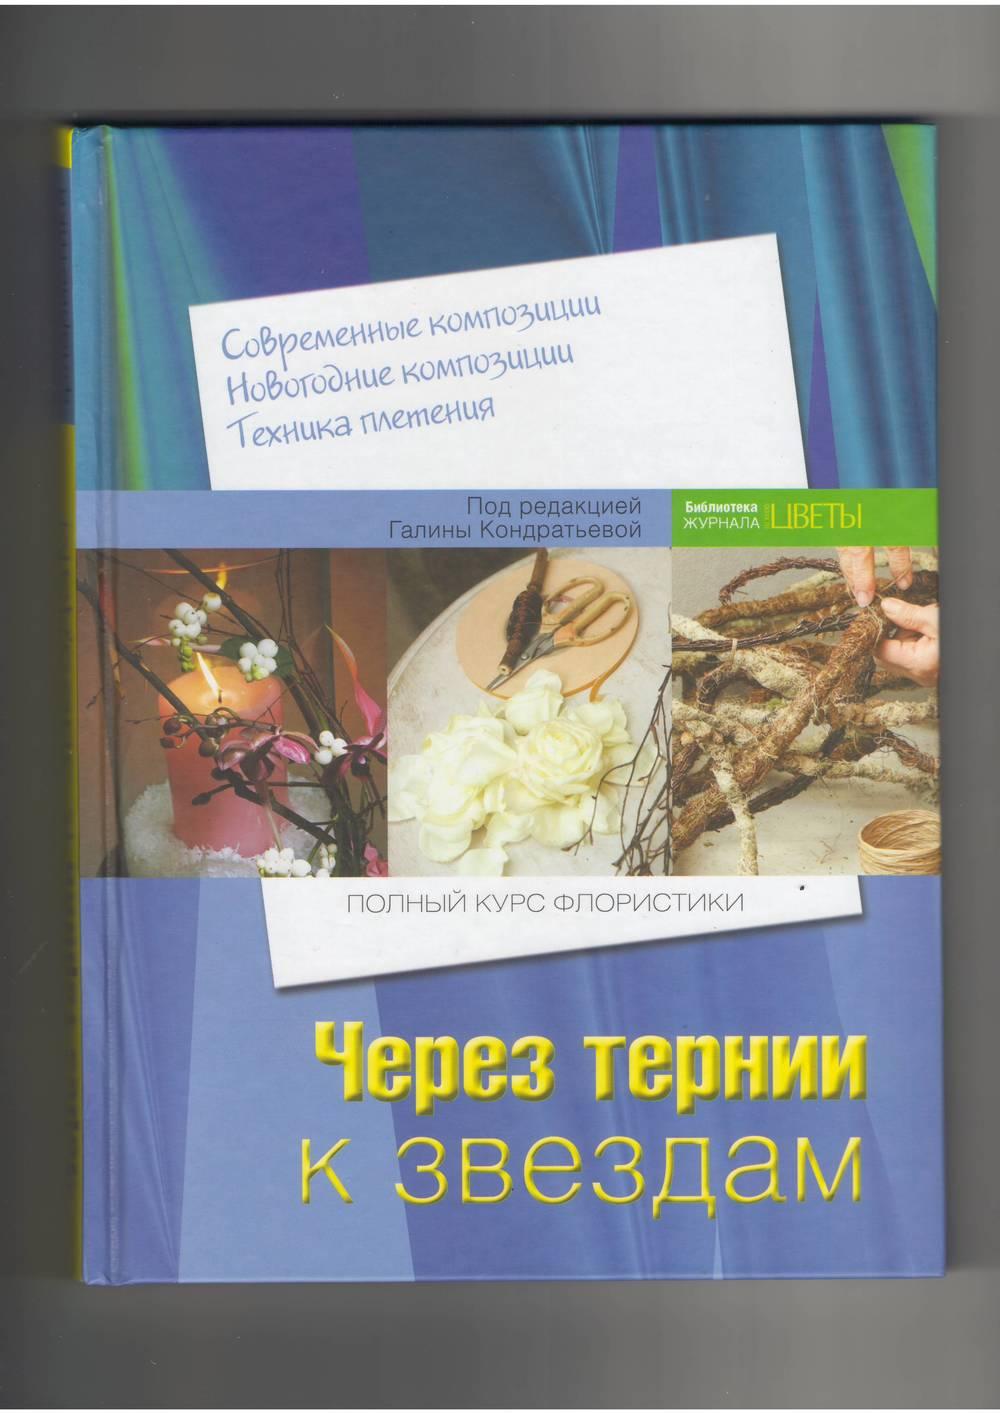 Книга композиции.JPG